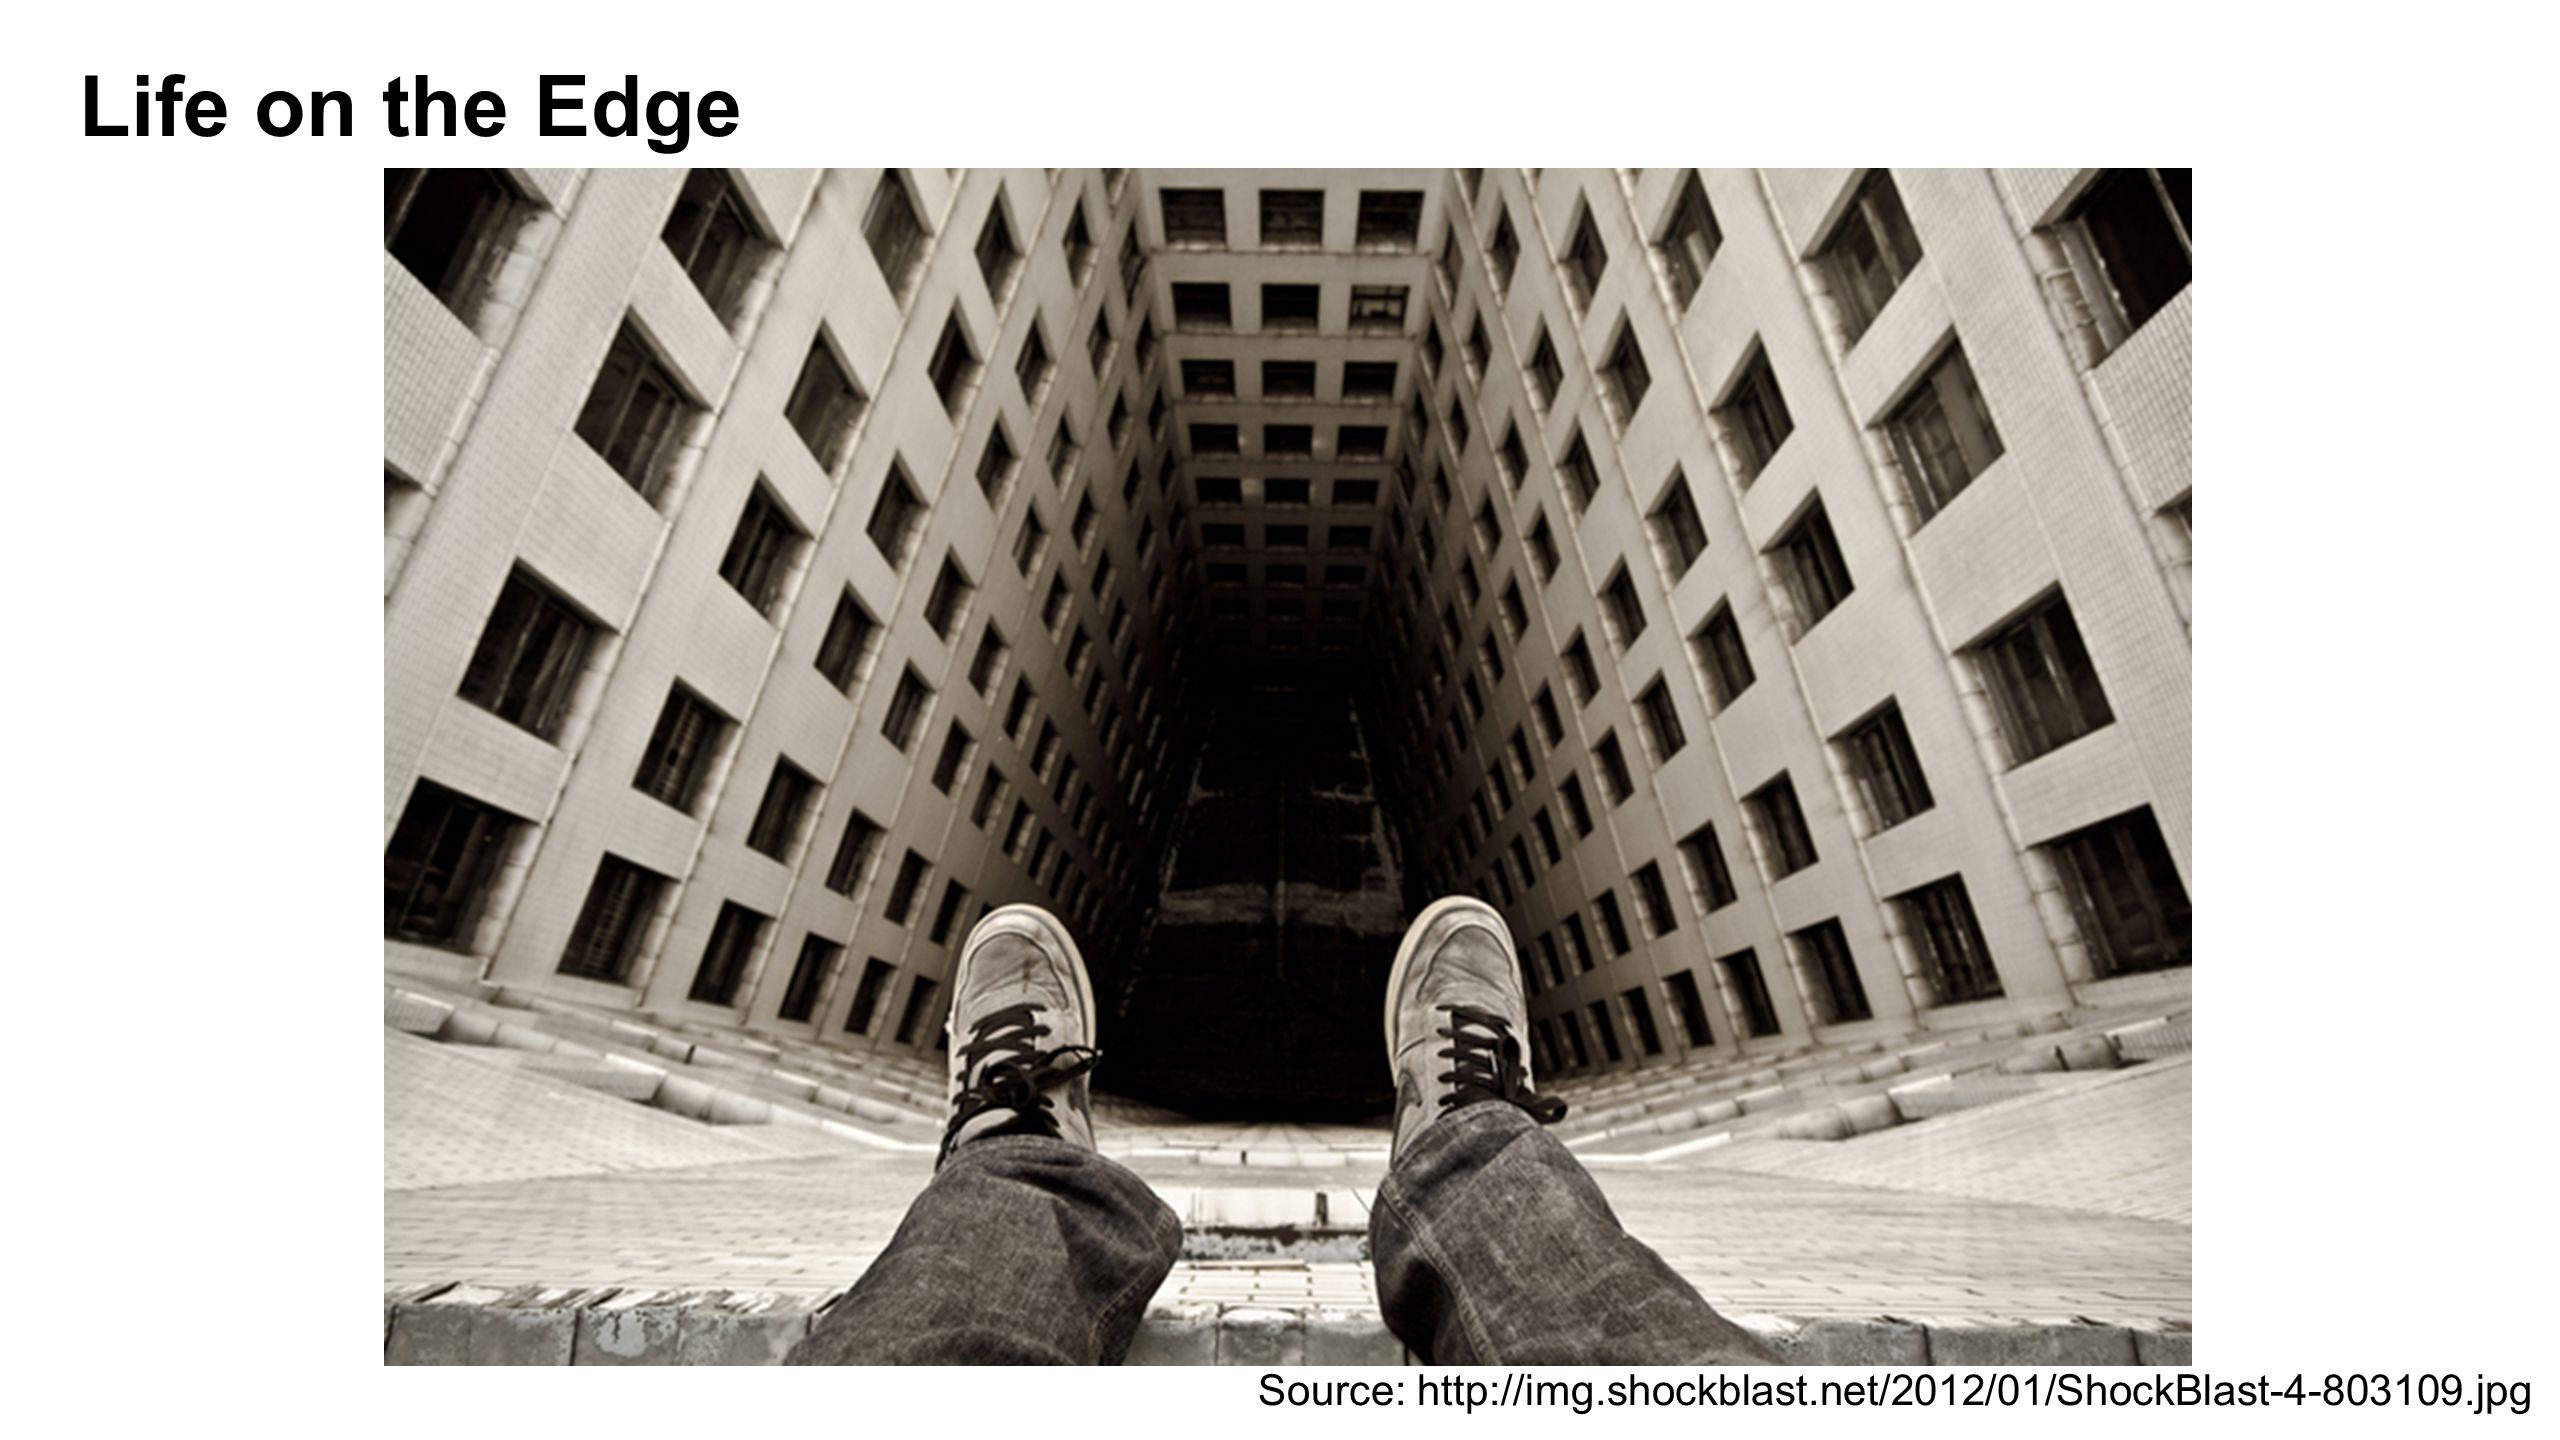 Life on the Edge Source: http://img.shockblast.net/2012/01/ShockBlast-4-803109.jpg